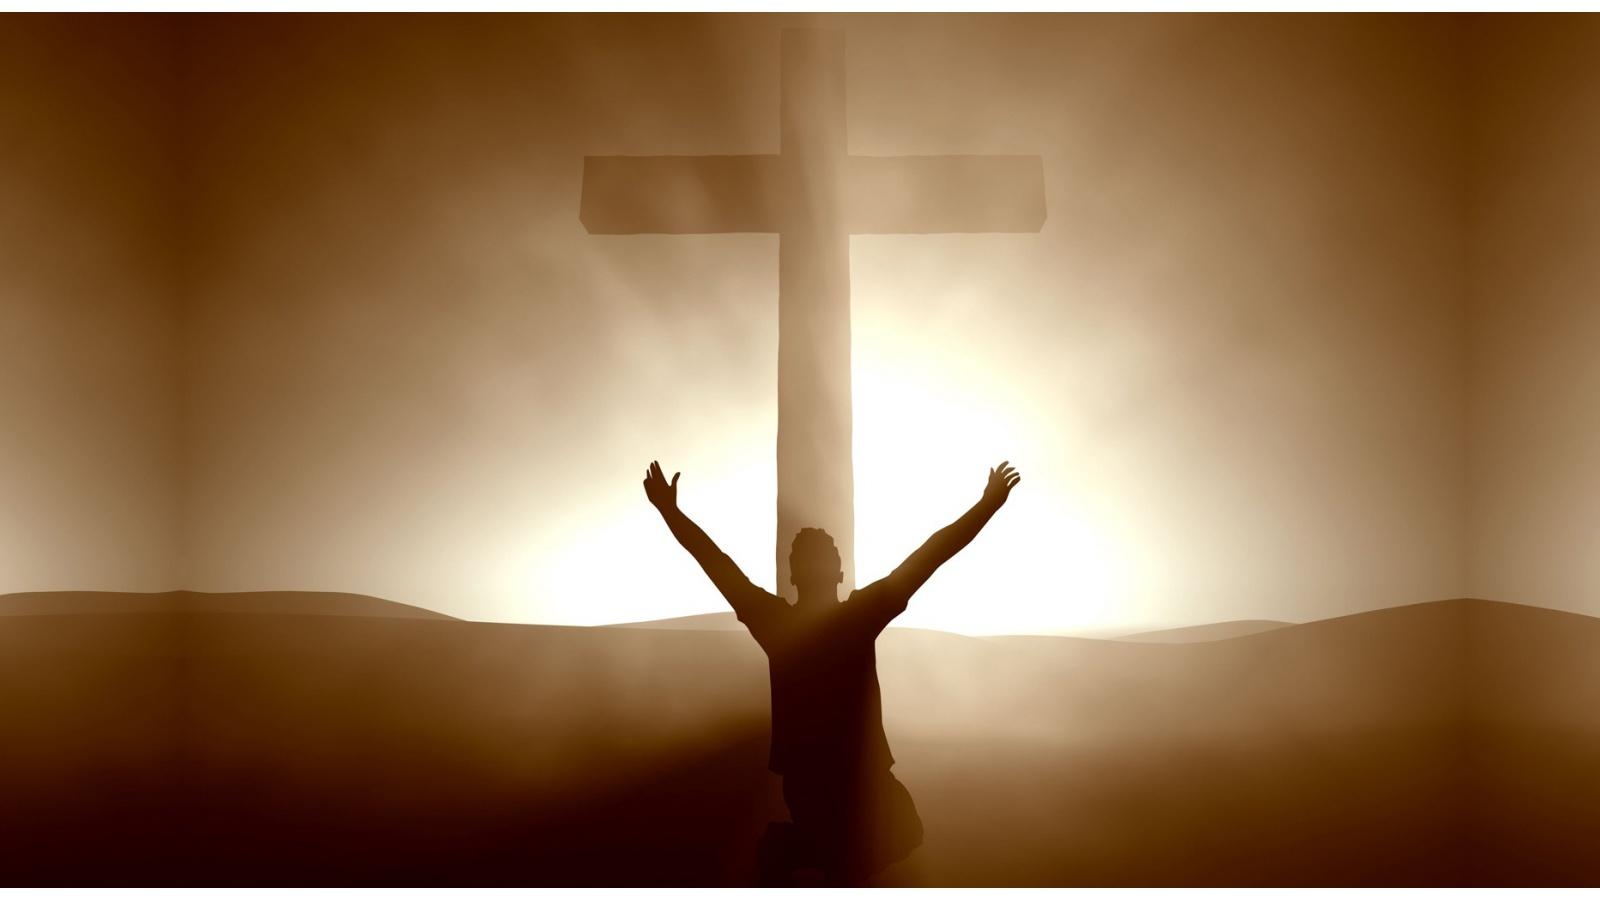 Christian Facebook Covers For Timeline Christian prayer 1600x900